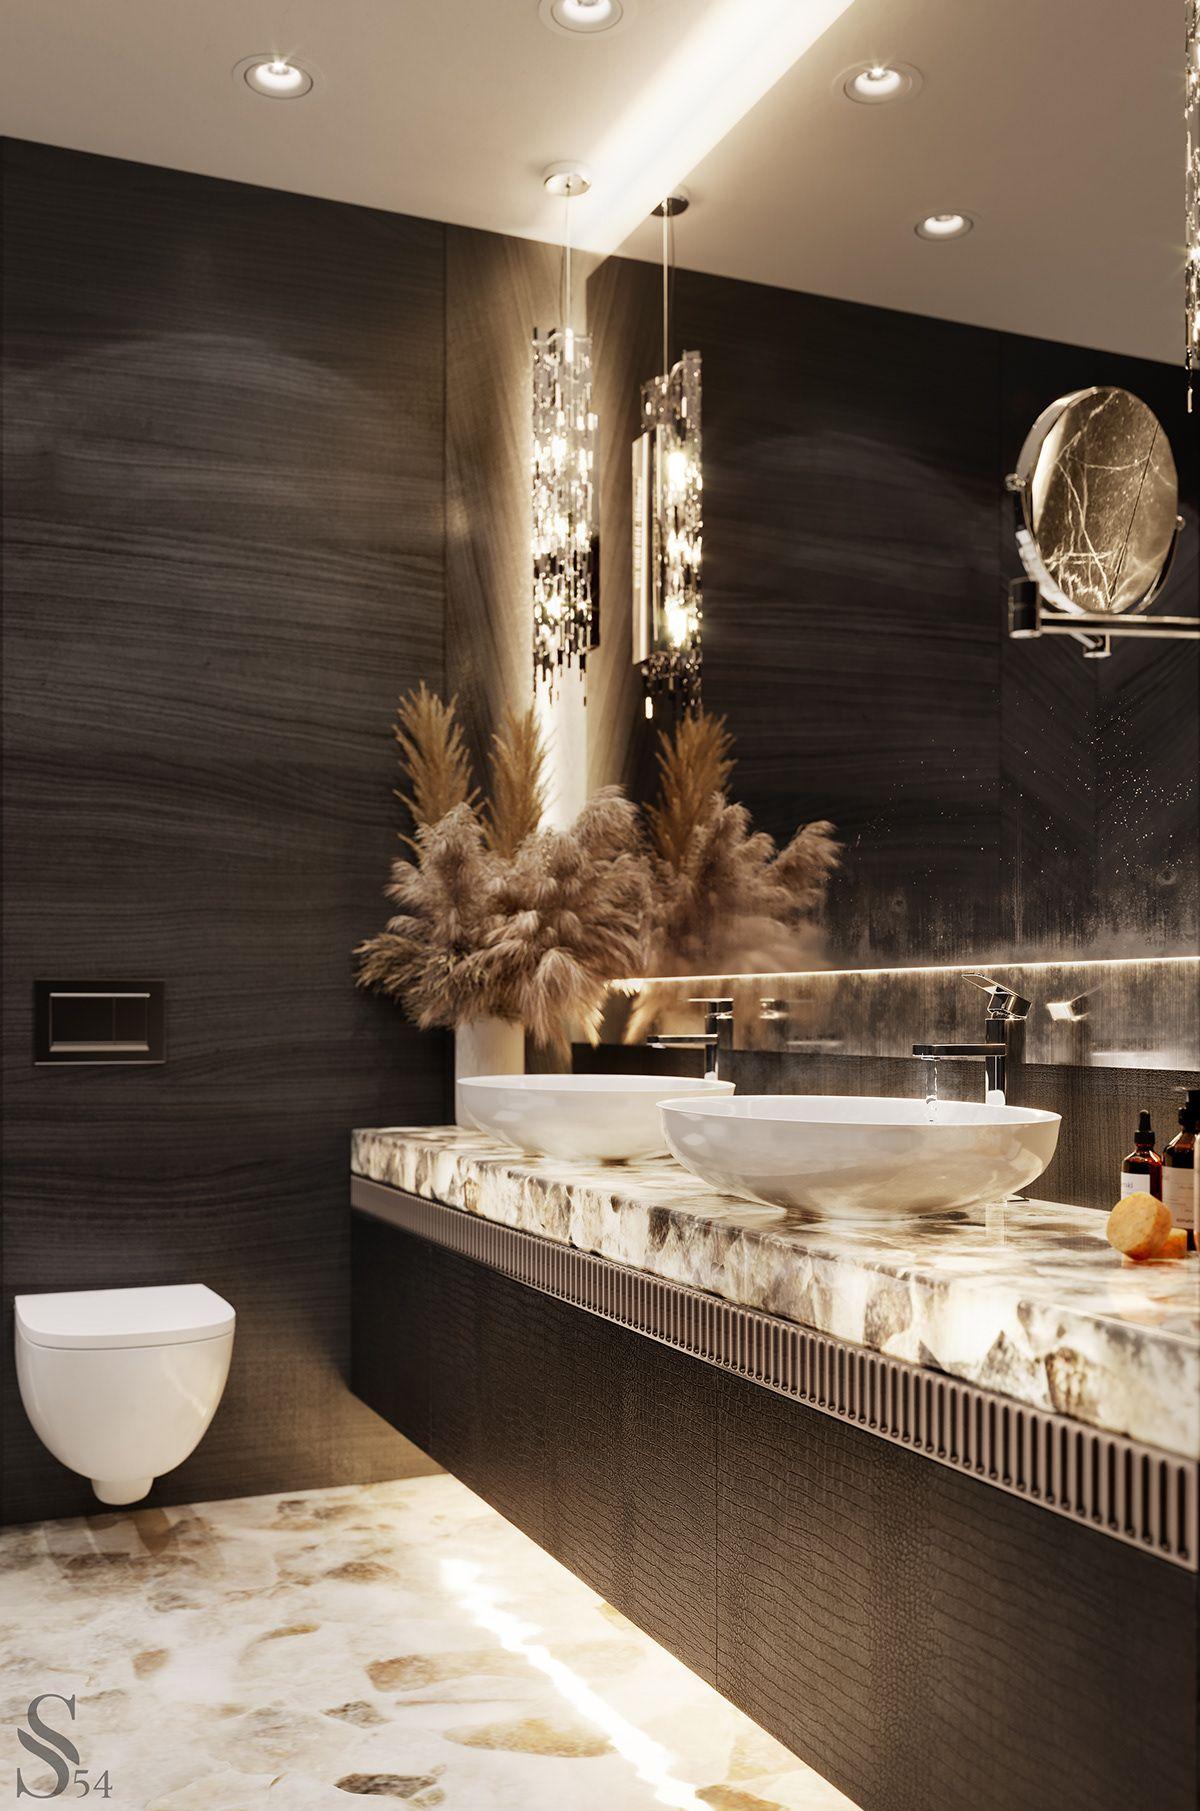 Apartment In Kiev On Behance In 2020 Bathroom Decor Apartment Bathroom Interior Design Luxurious Bedrooms